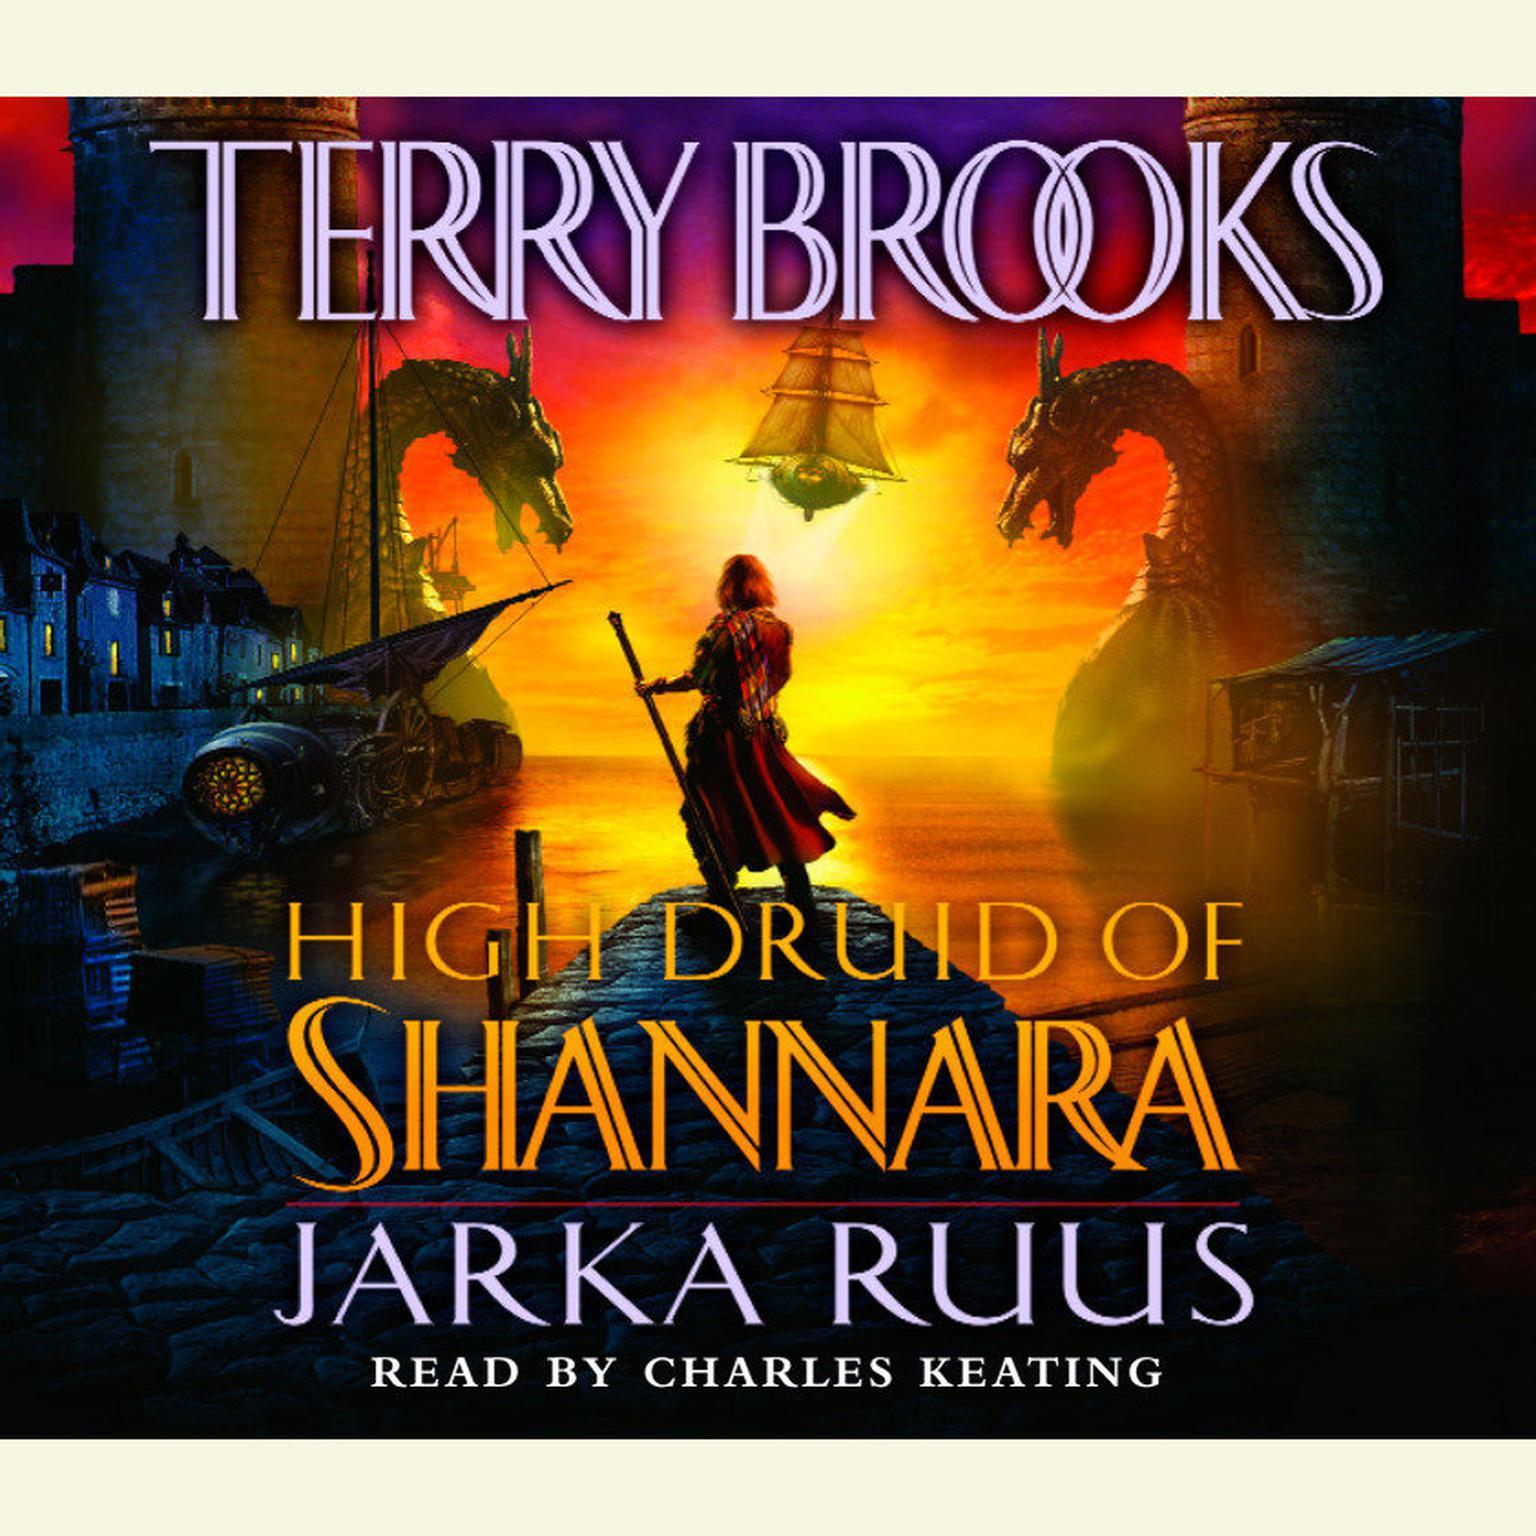 Printable High Druid of Shannara: Jarka Ruus Audiobook Cover Art